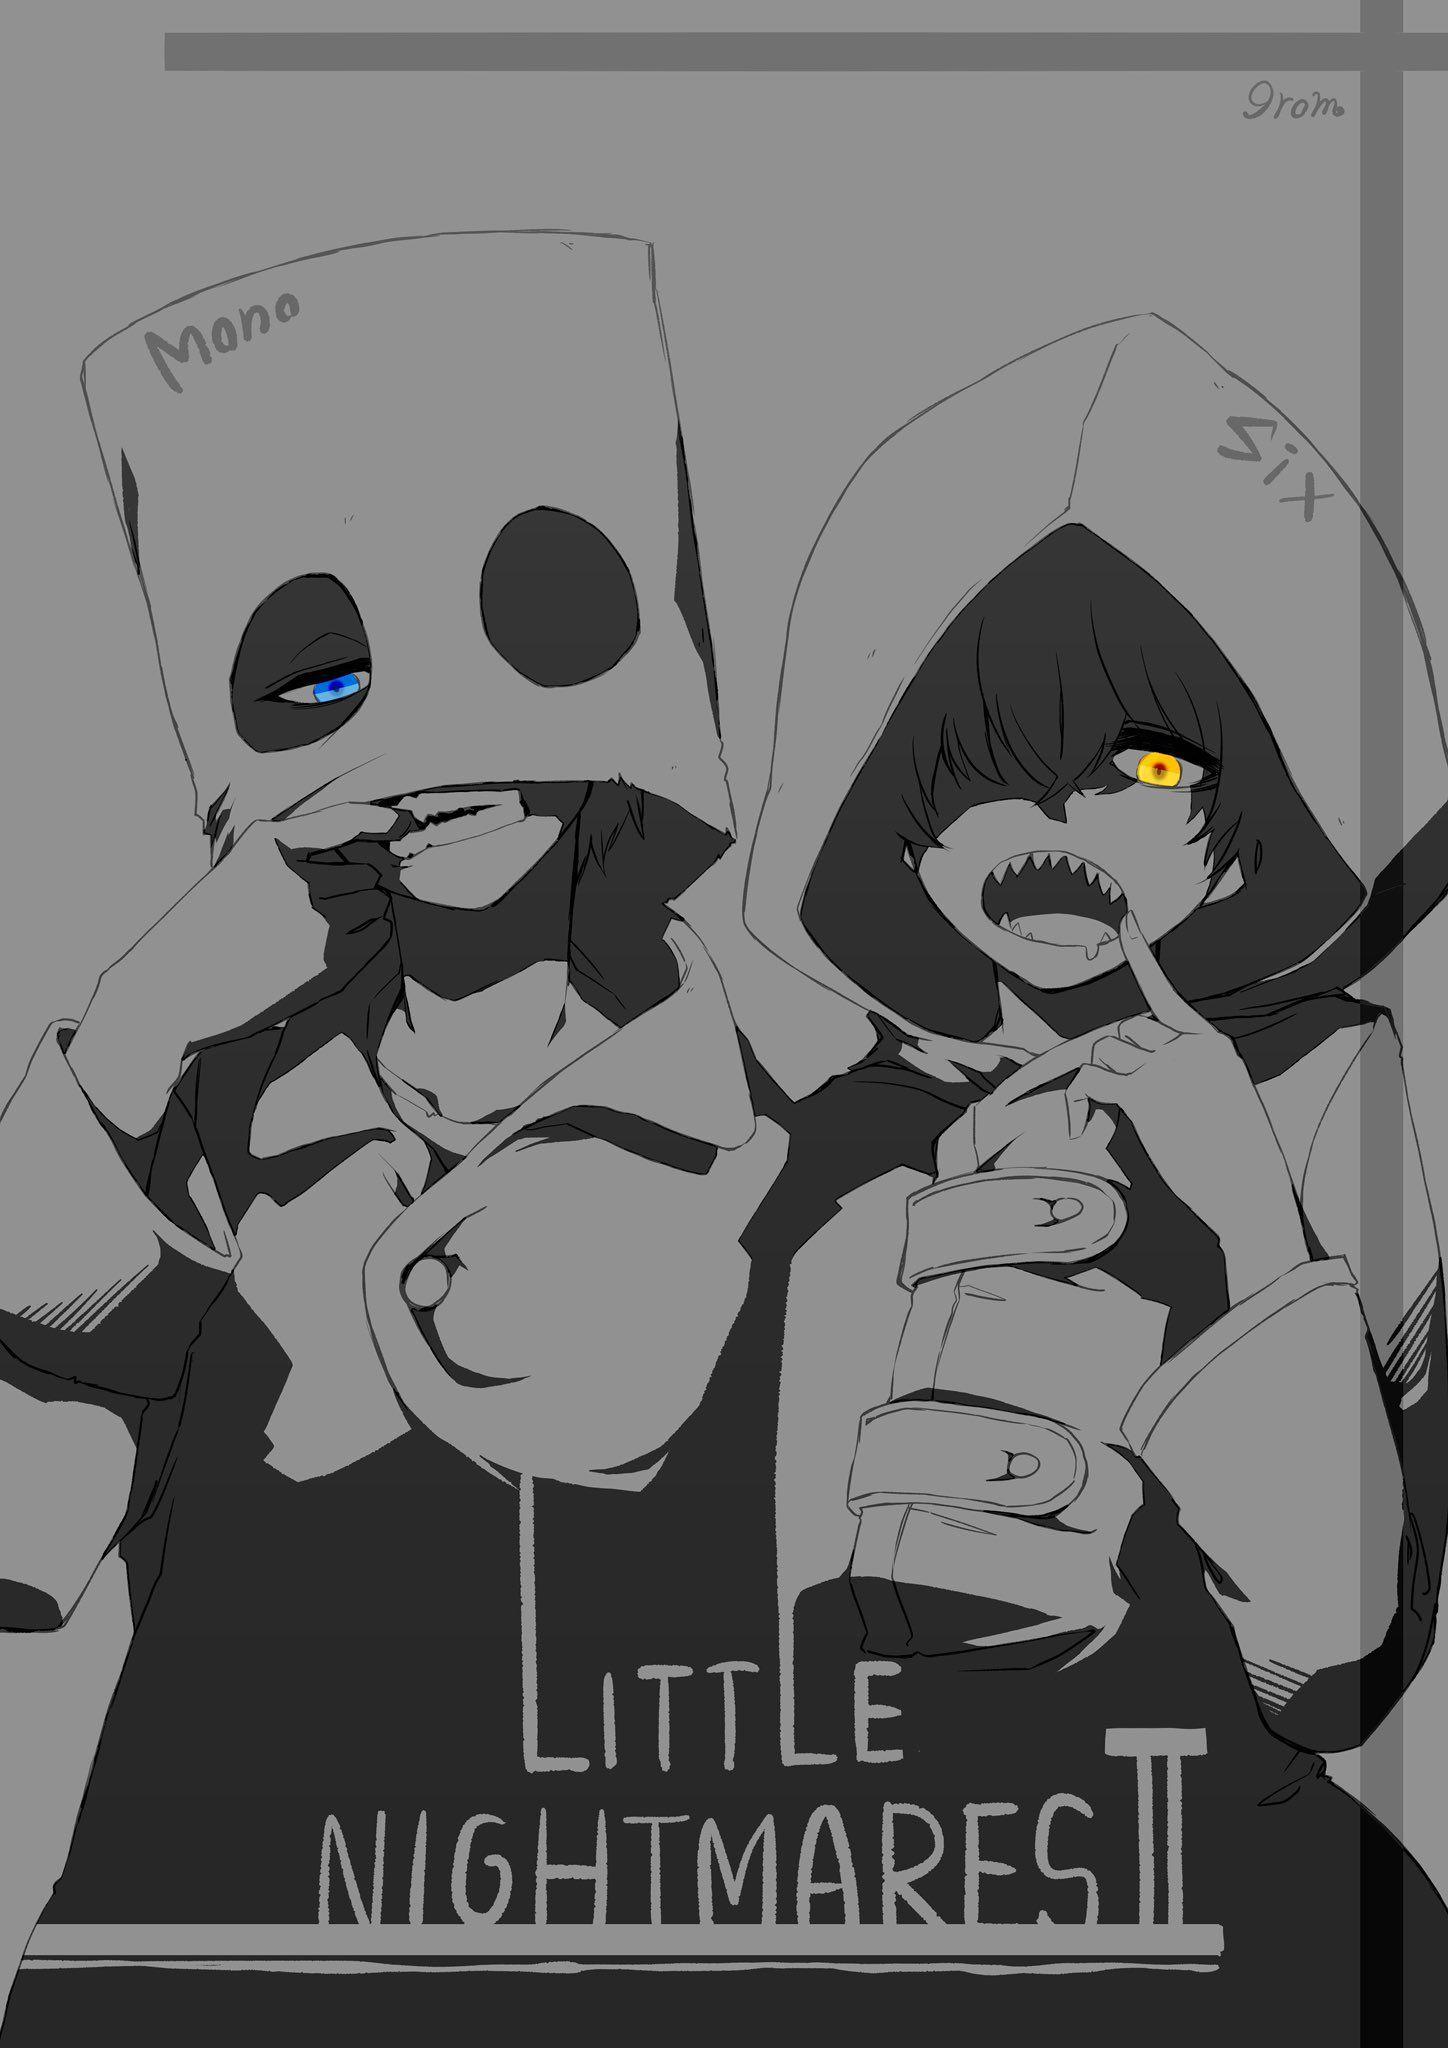 9rom/クロム on Twitter